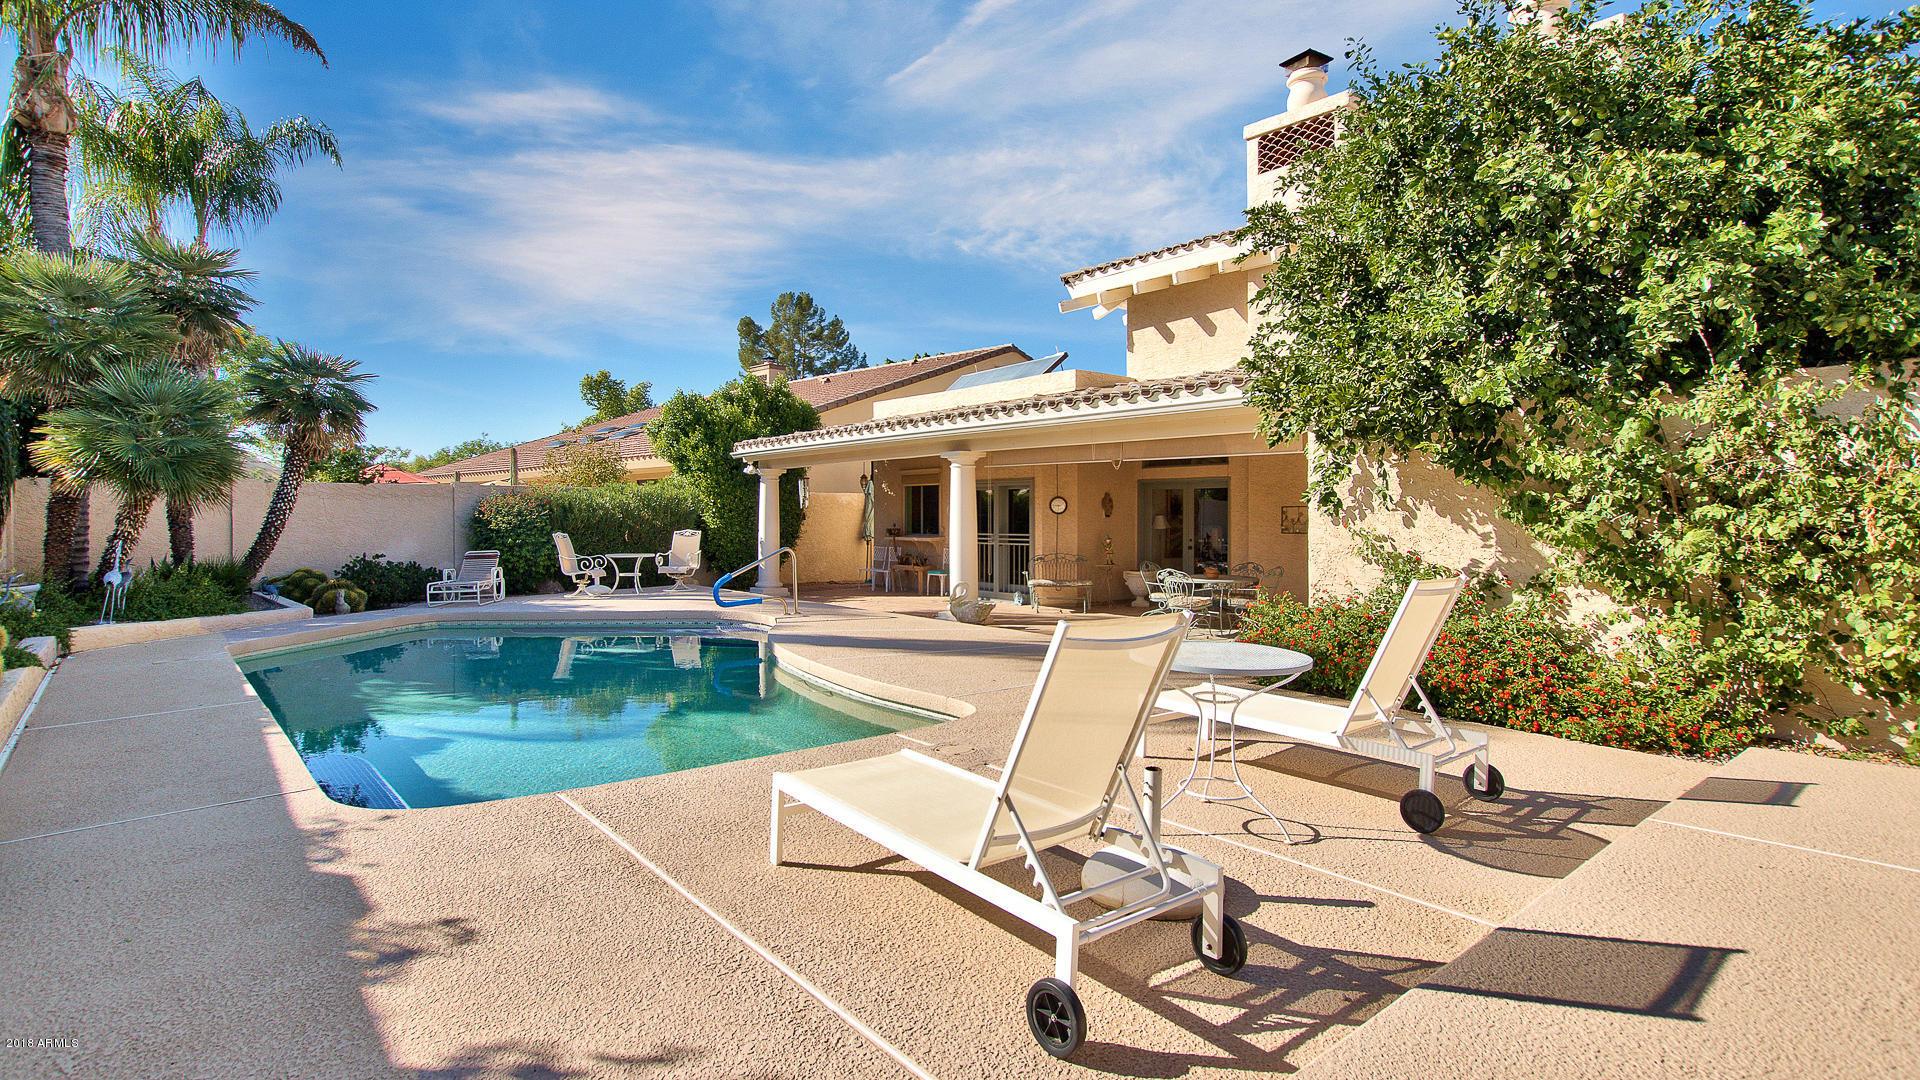 MLS 5842687 8205 E DEL CADENA Drive, Scottsdale, AZ 85258 Scottsdale AZ McCormick Ranch